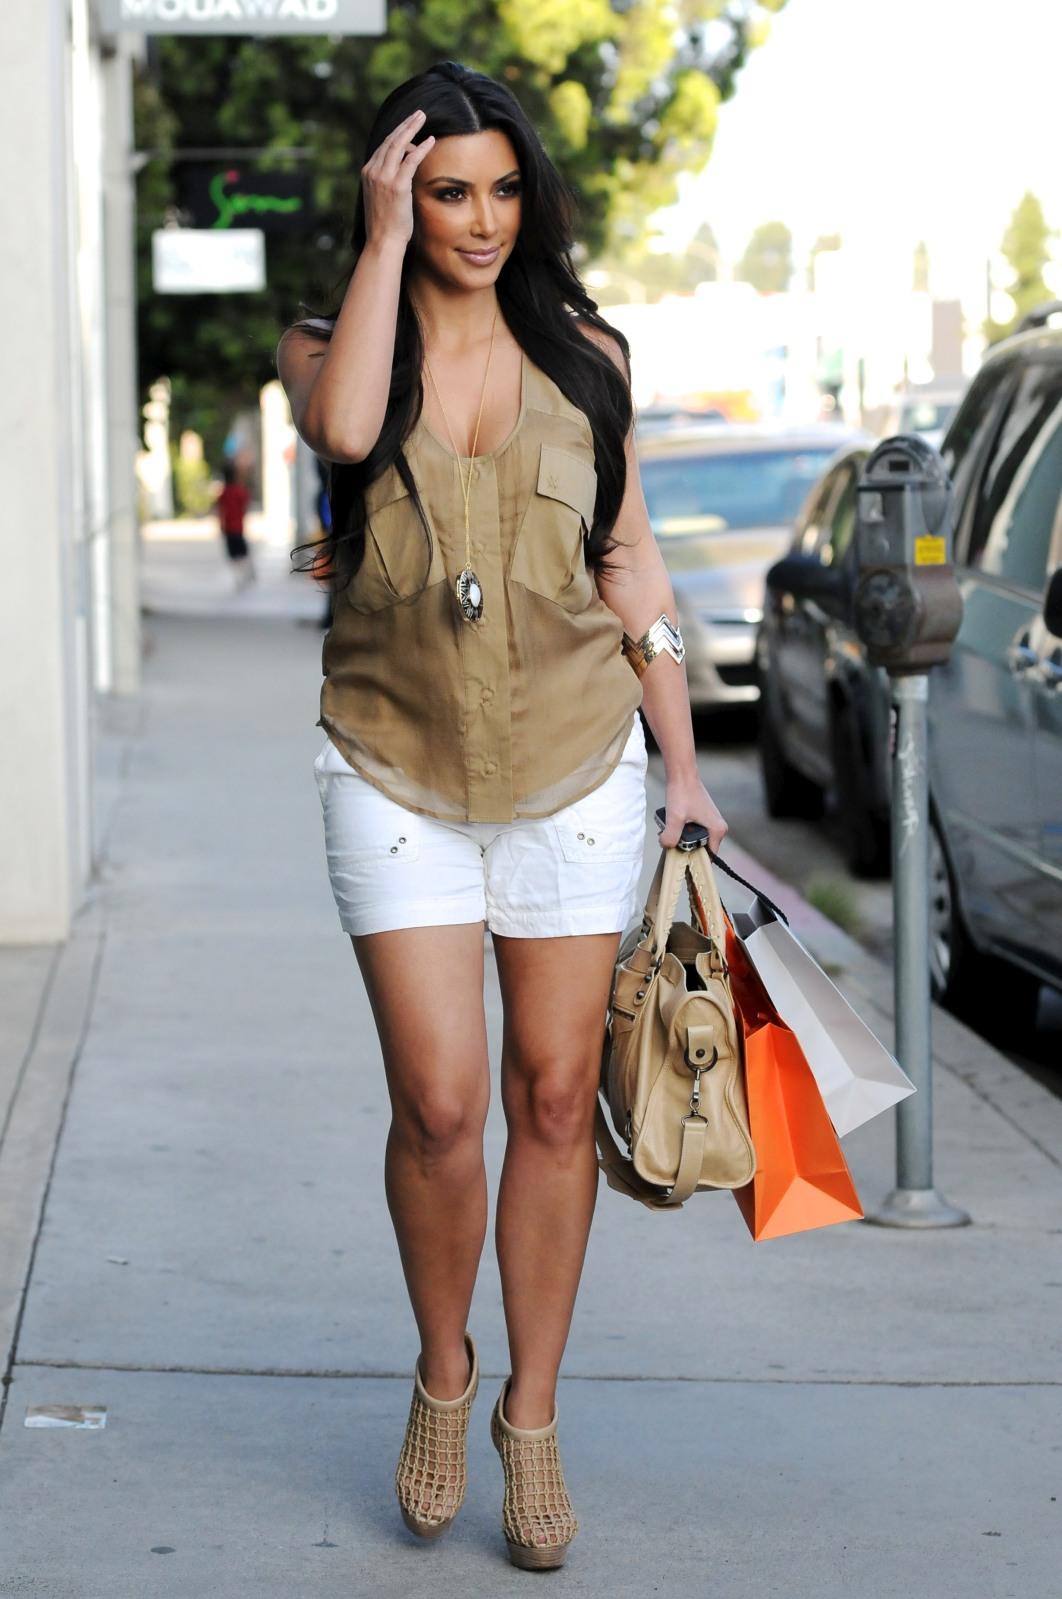 Alison Brie Kim Kardashian Offers Style Tips